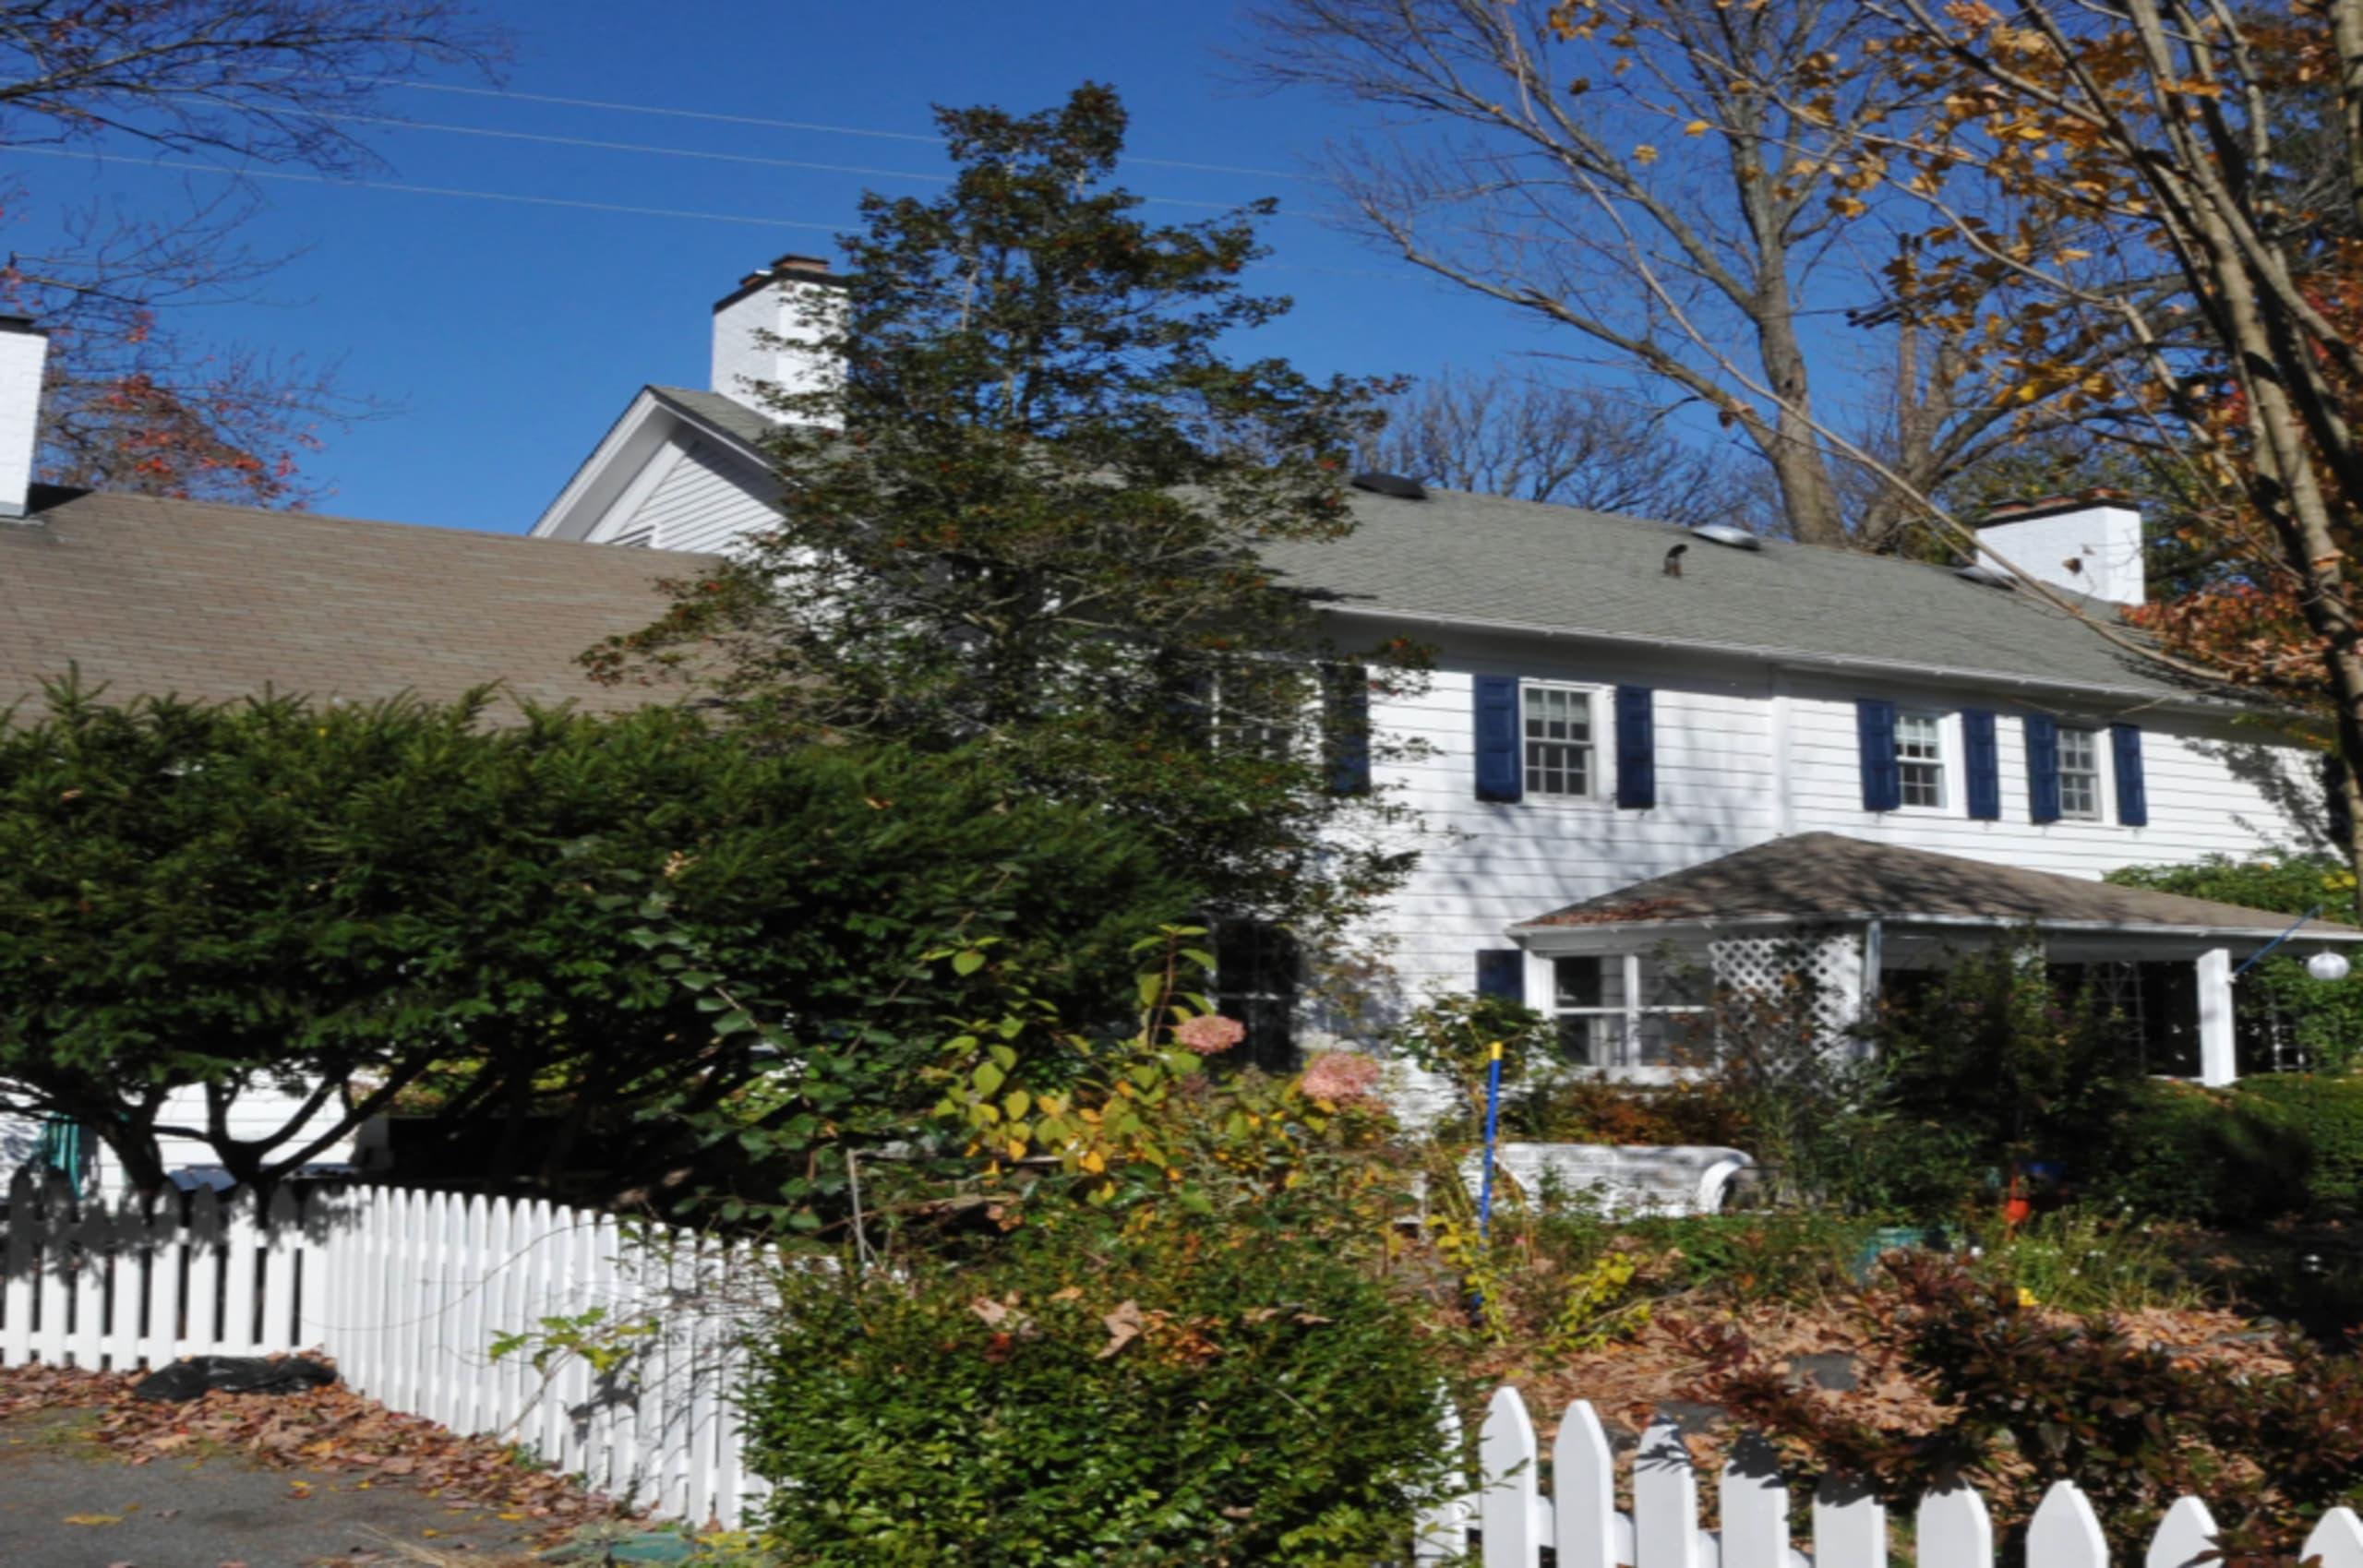 south brunswick nj Homes For Sale